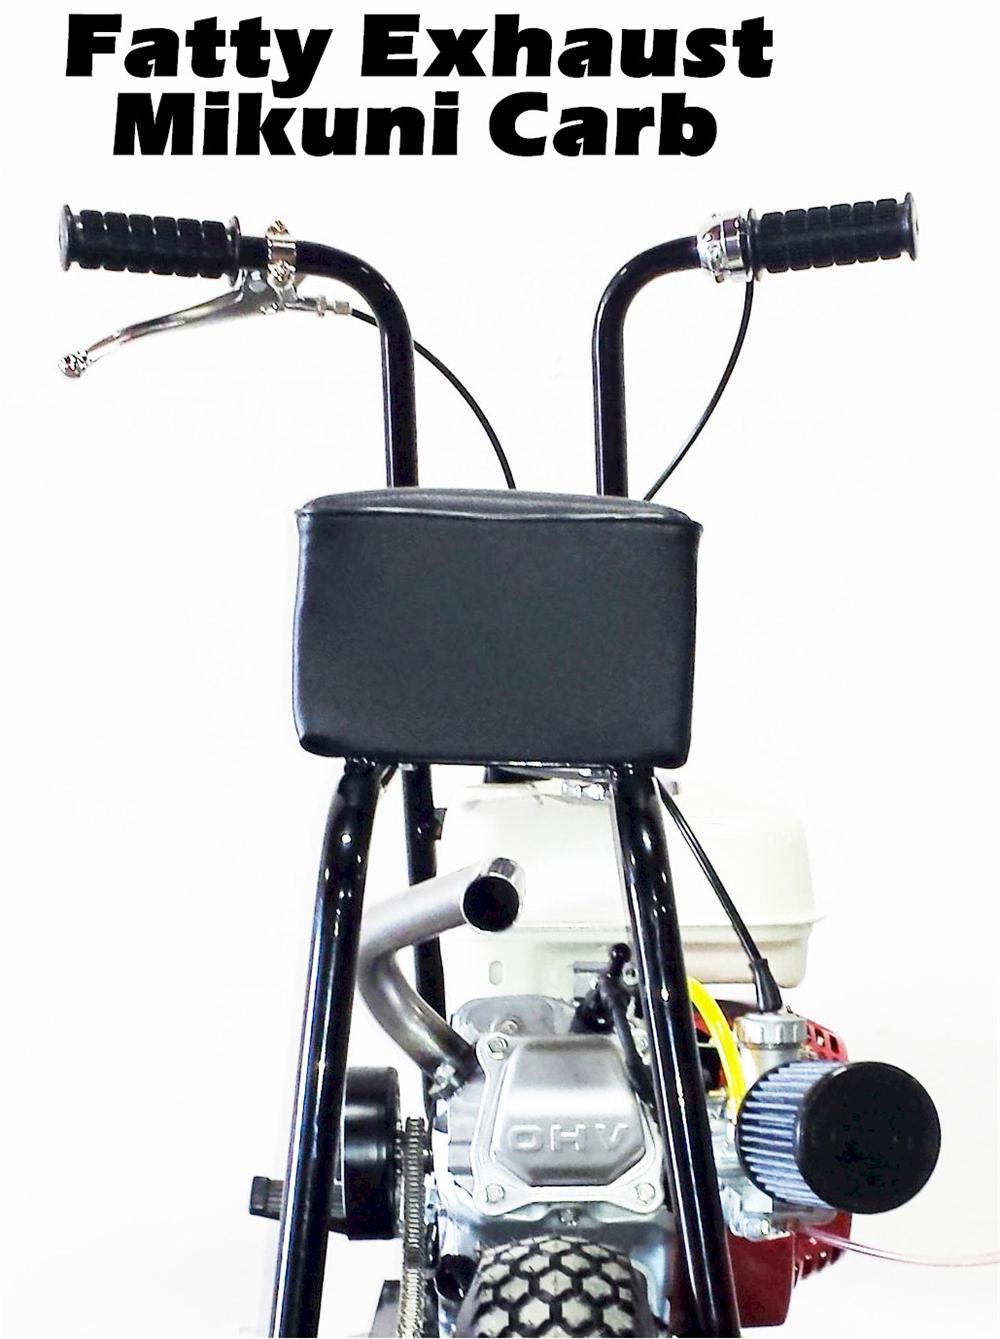 mikuni stage  kit stinger exhaust  predator  engine